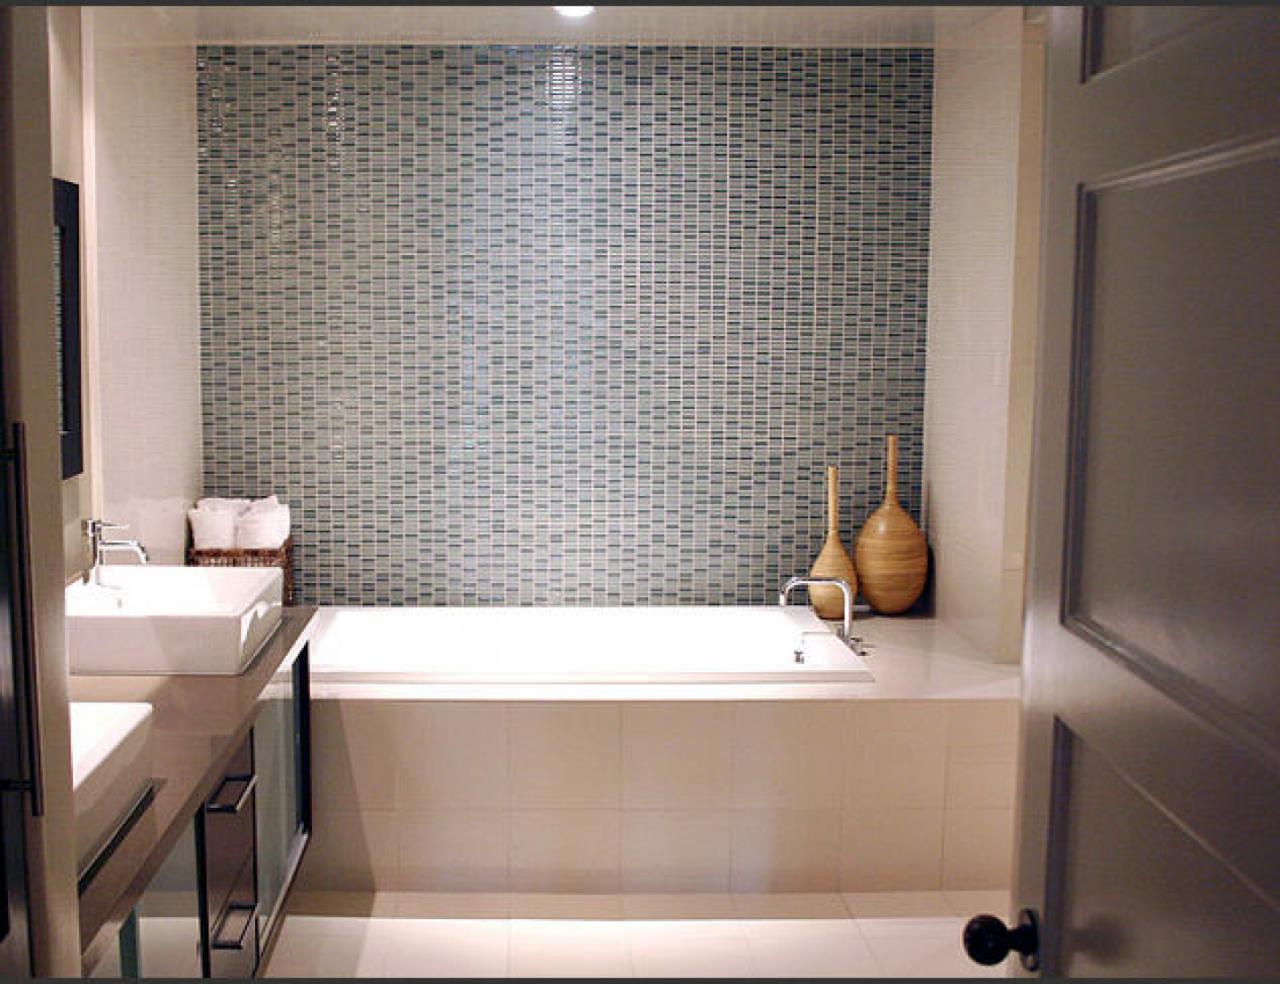 Small space modern bathroom tile design ideas